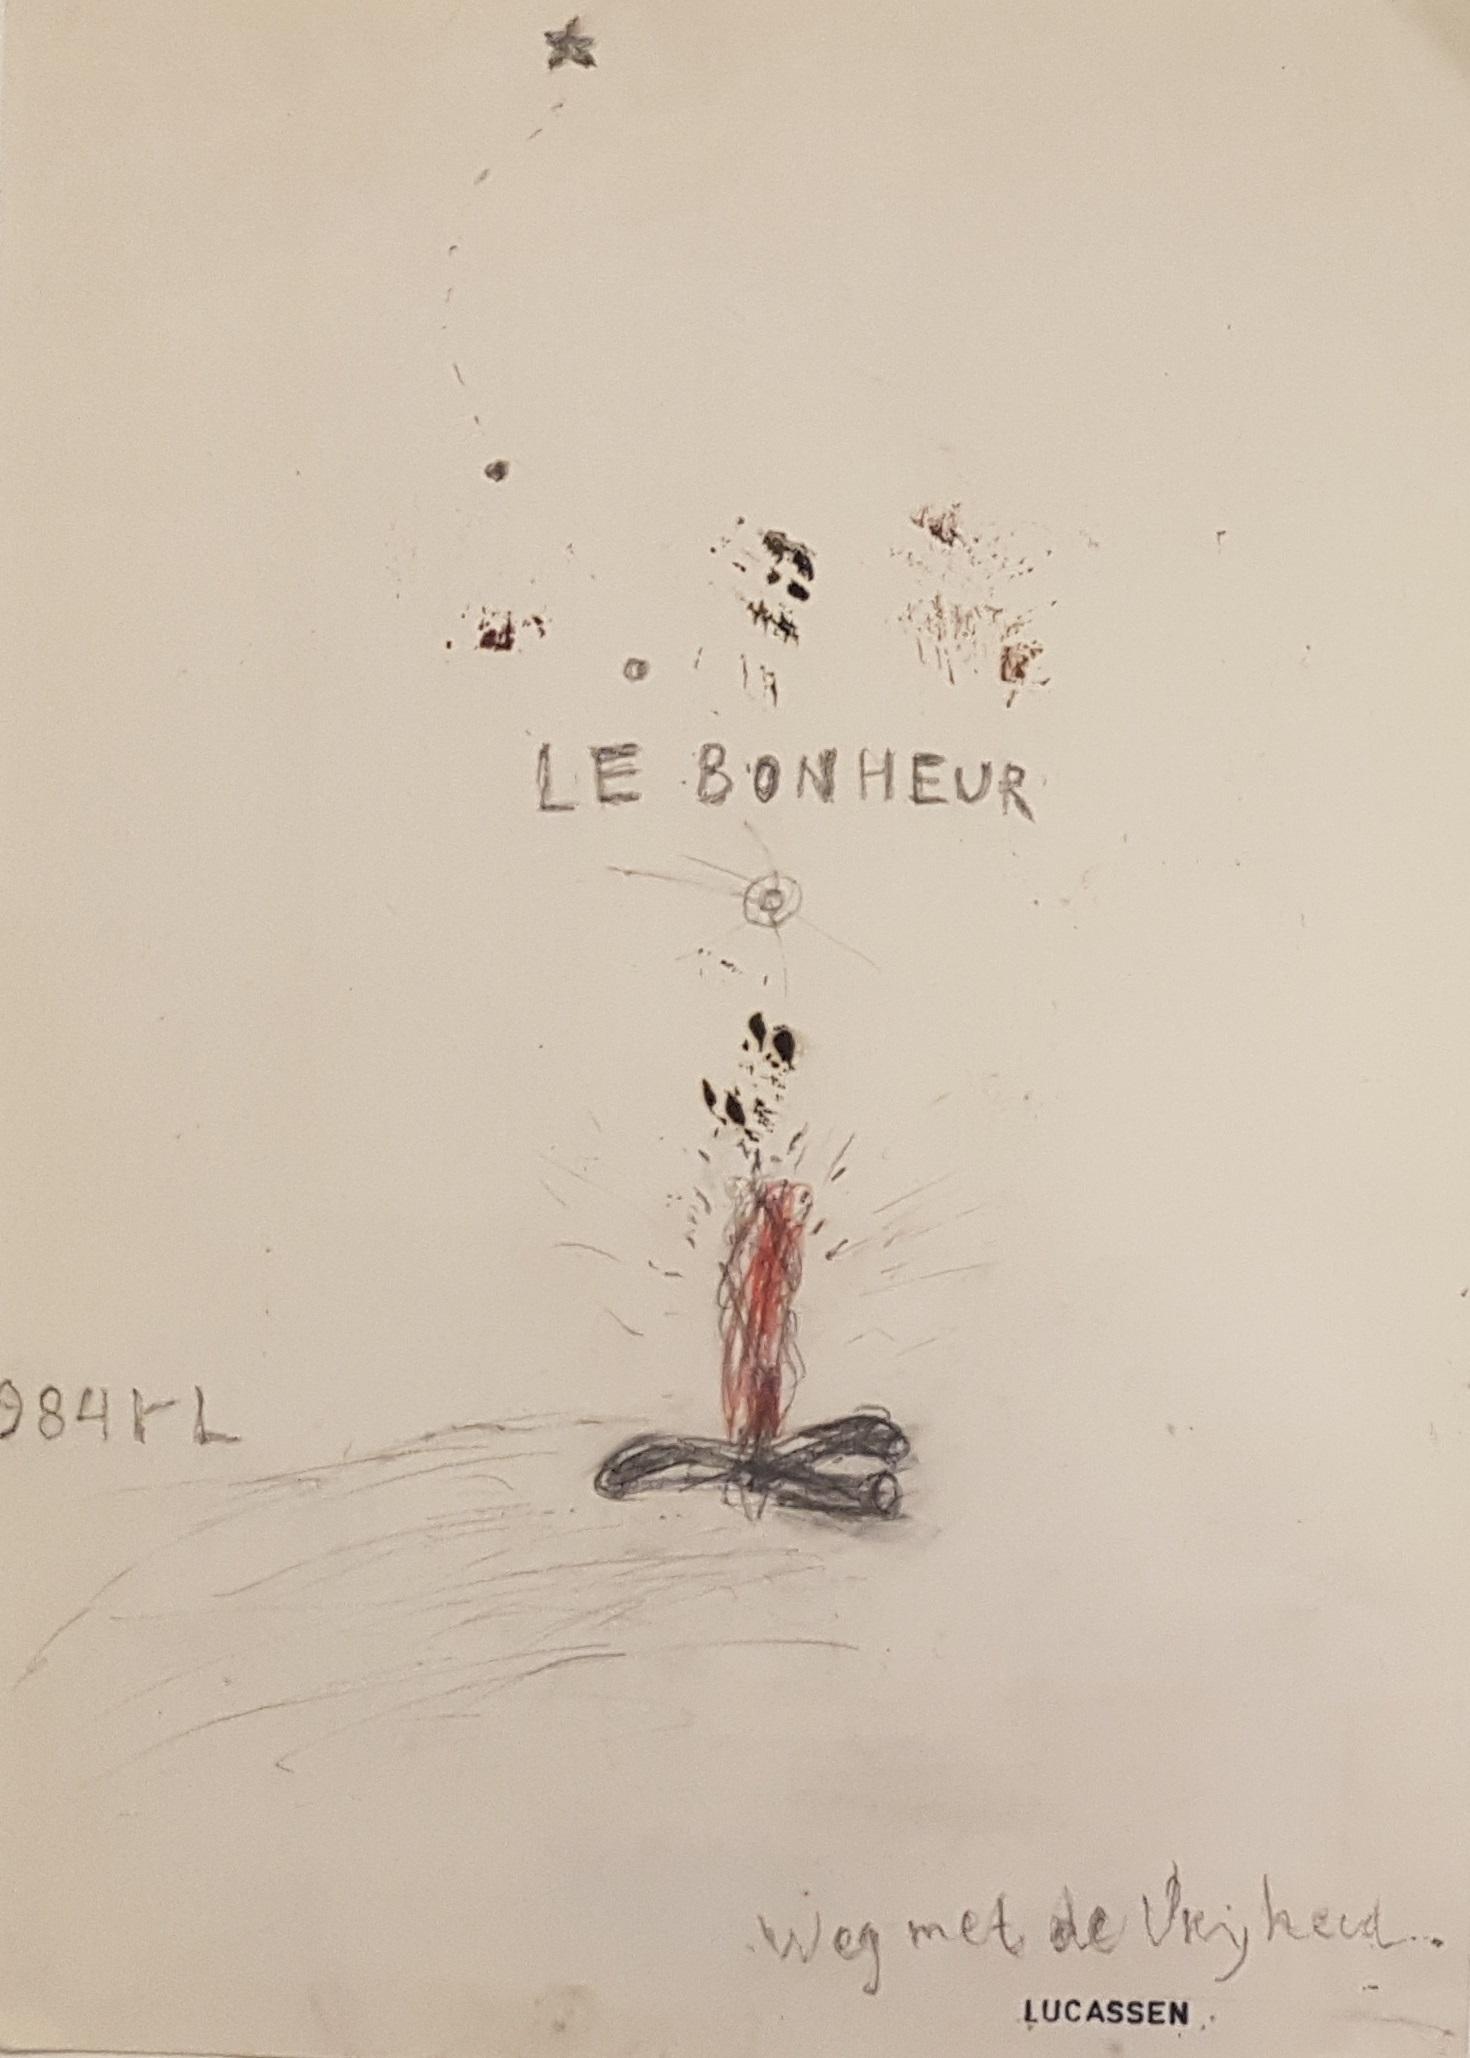 Le Bonheur / Weg met de vrijheid (1984)